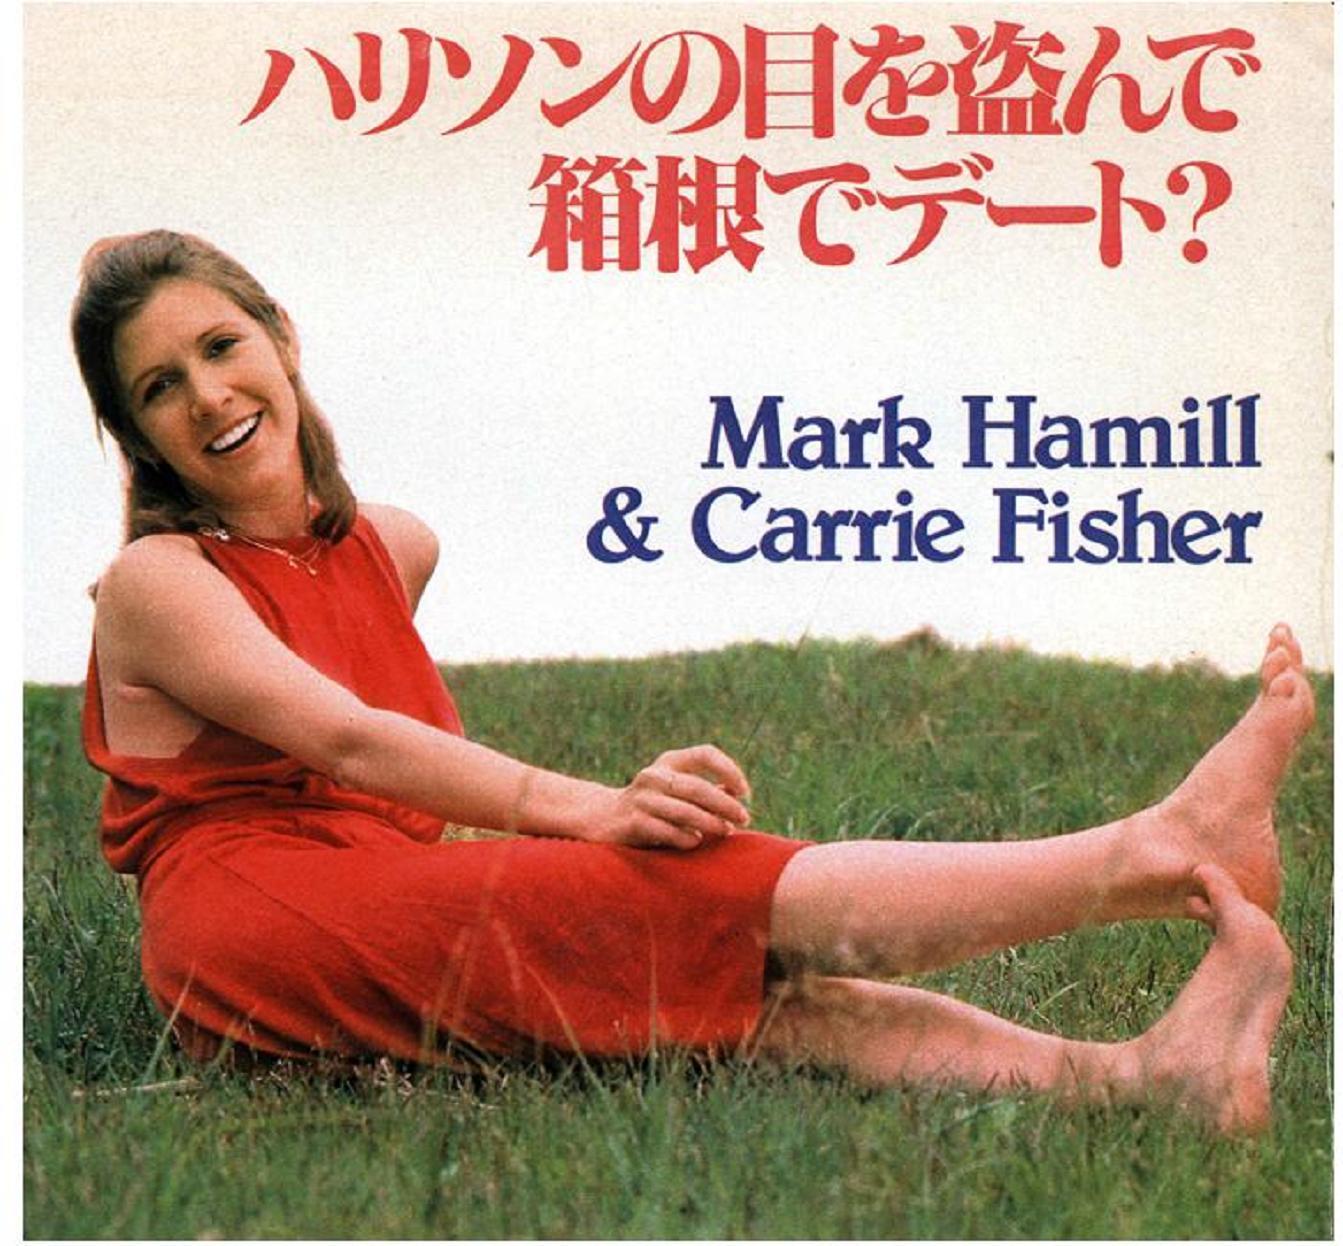 carrie fisher, mark hamill, feet